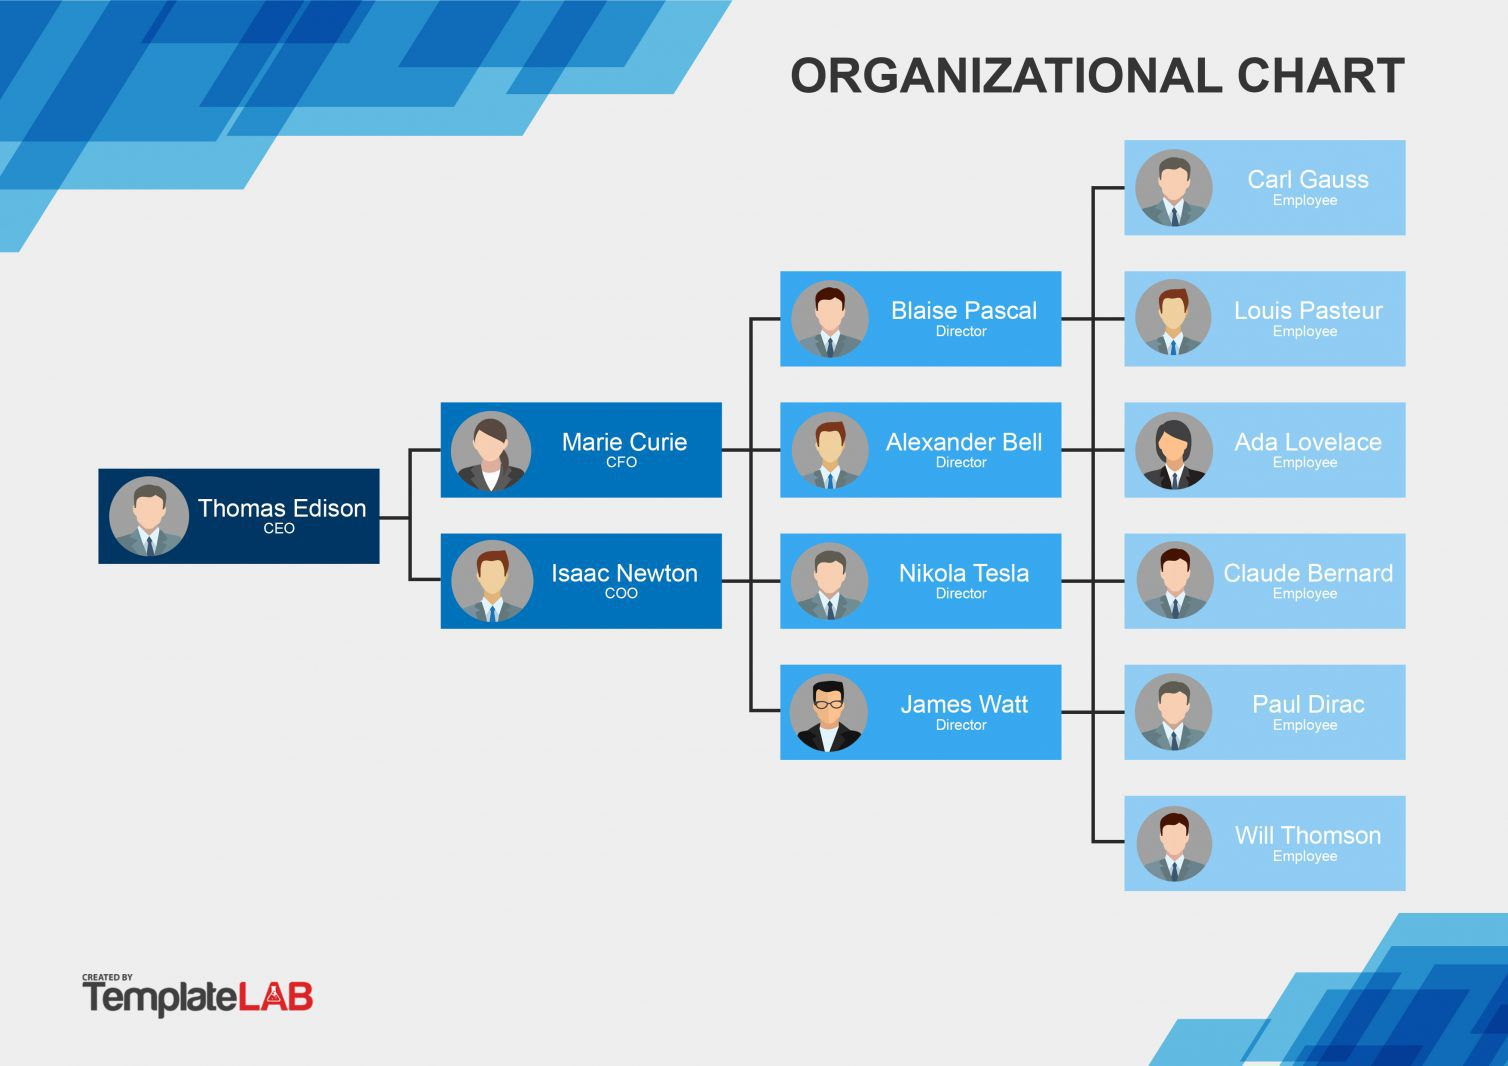 008 Wondrou Org Chart Template Powerpoint Example  Free Organization Download Organizational 2010Full